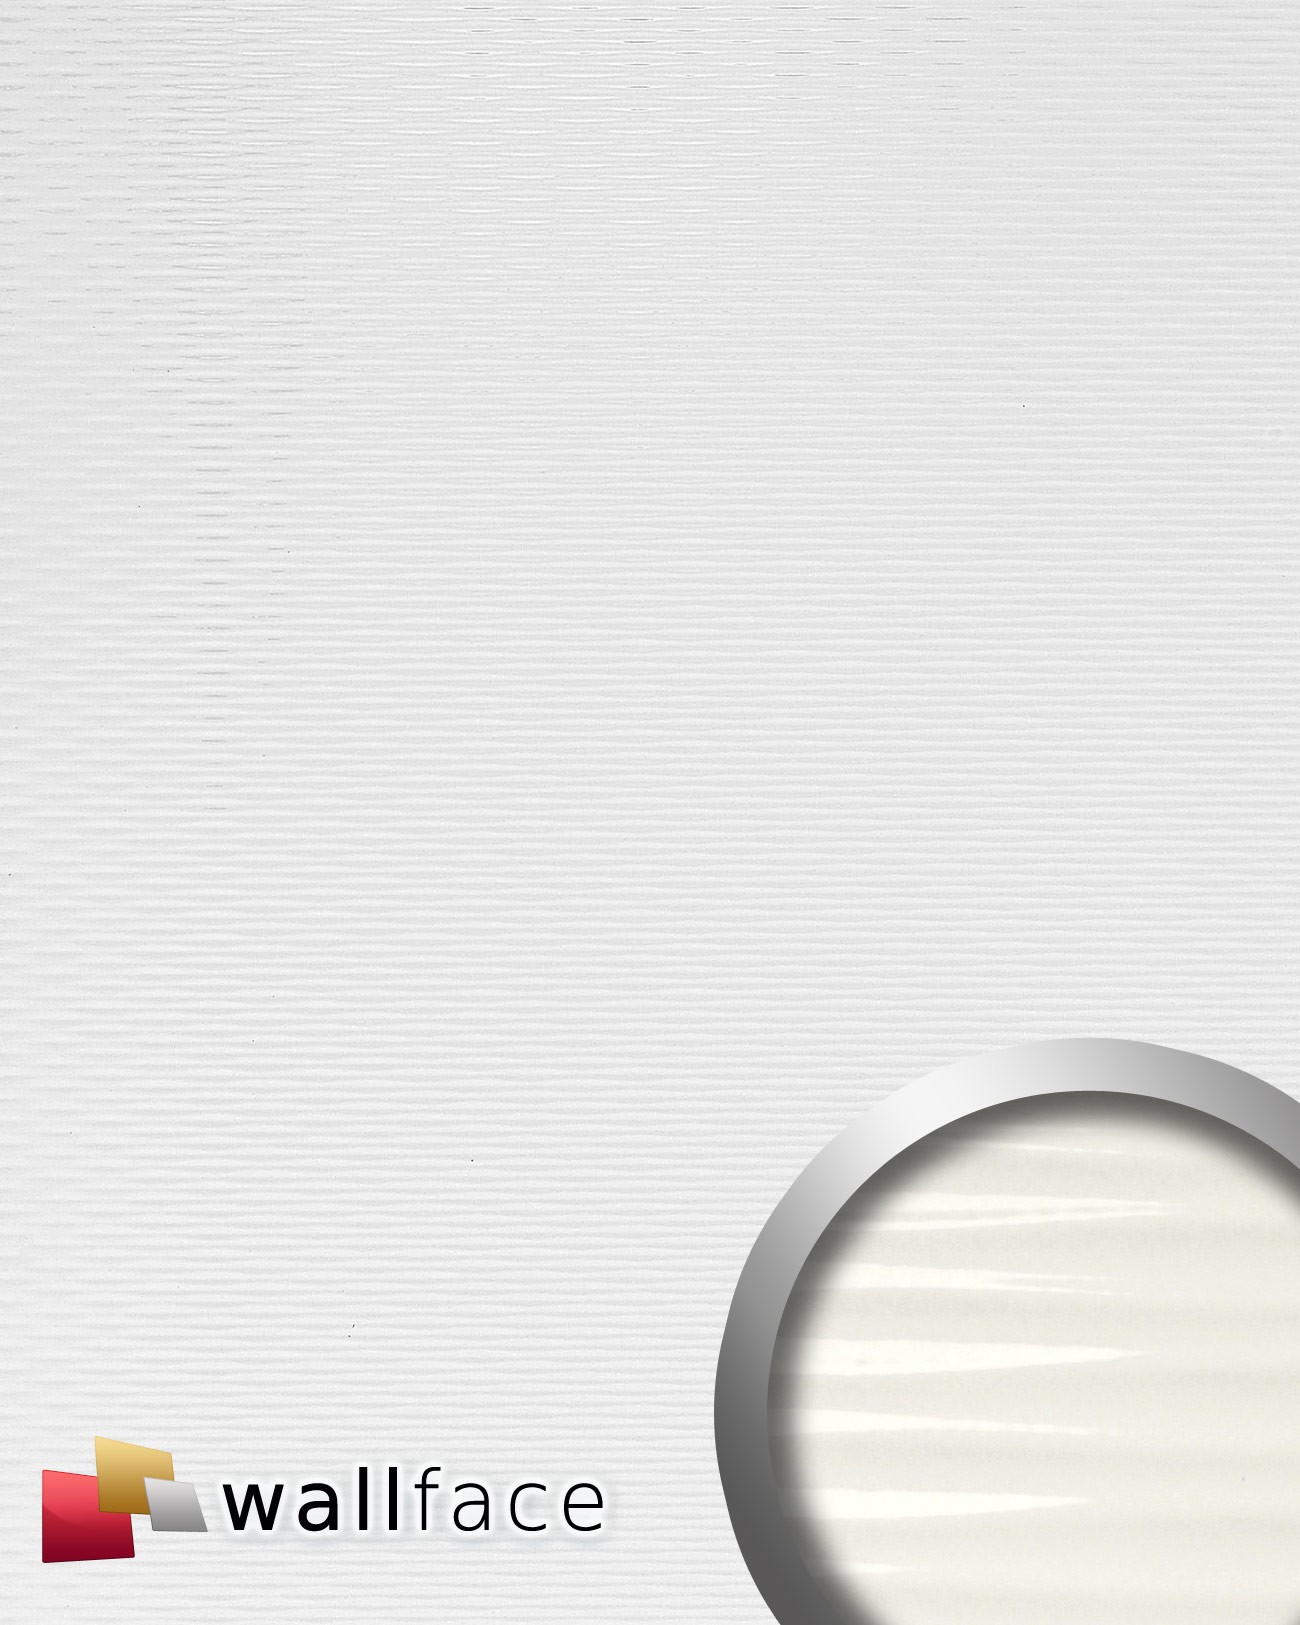 Panou Decorativ Acrylic 15764  Wallface  Autocolan